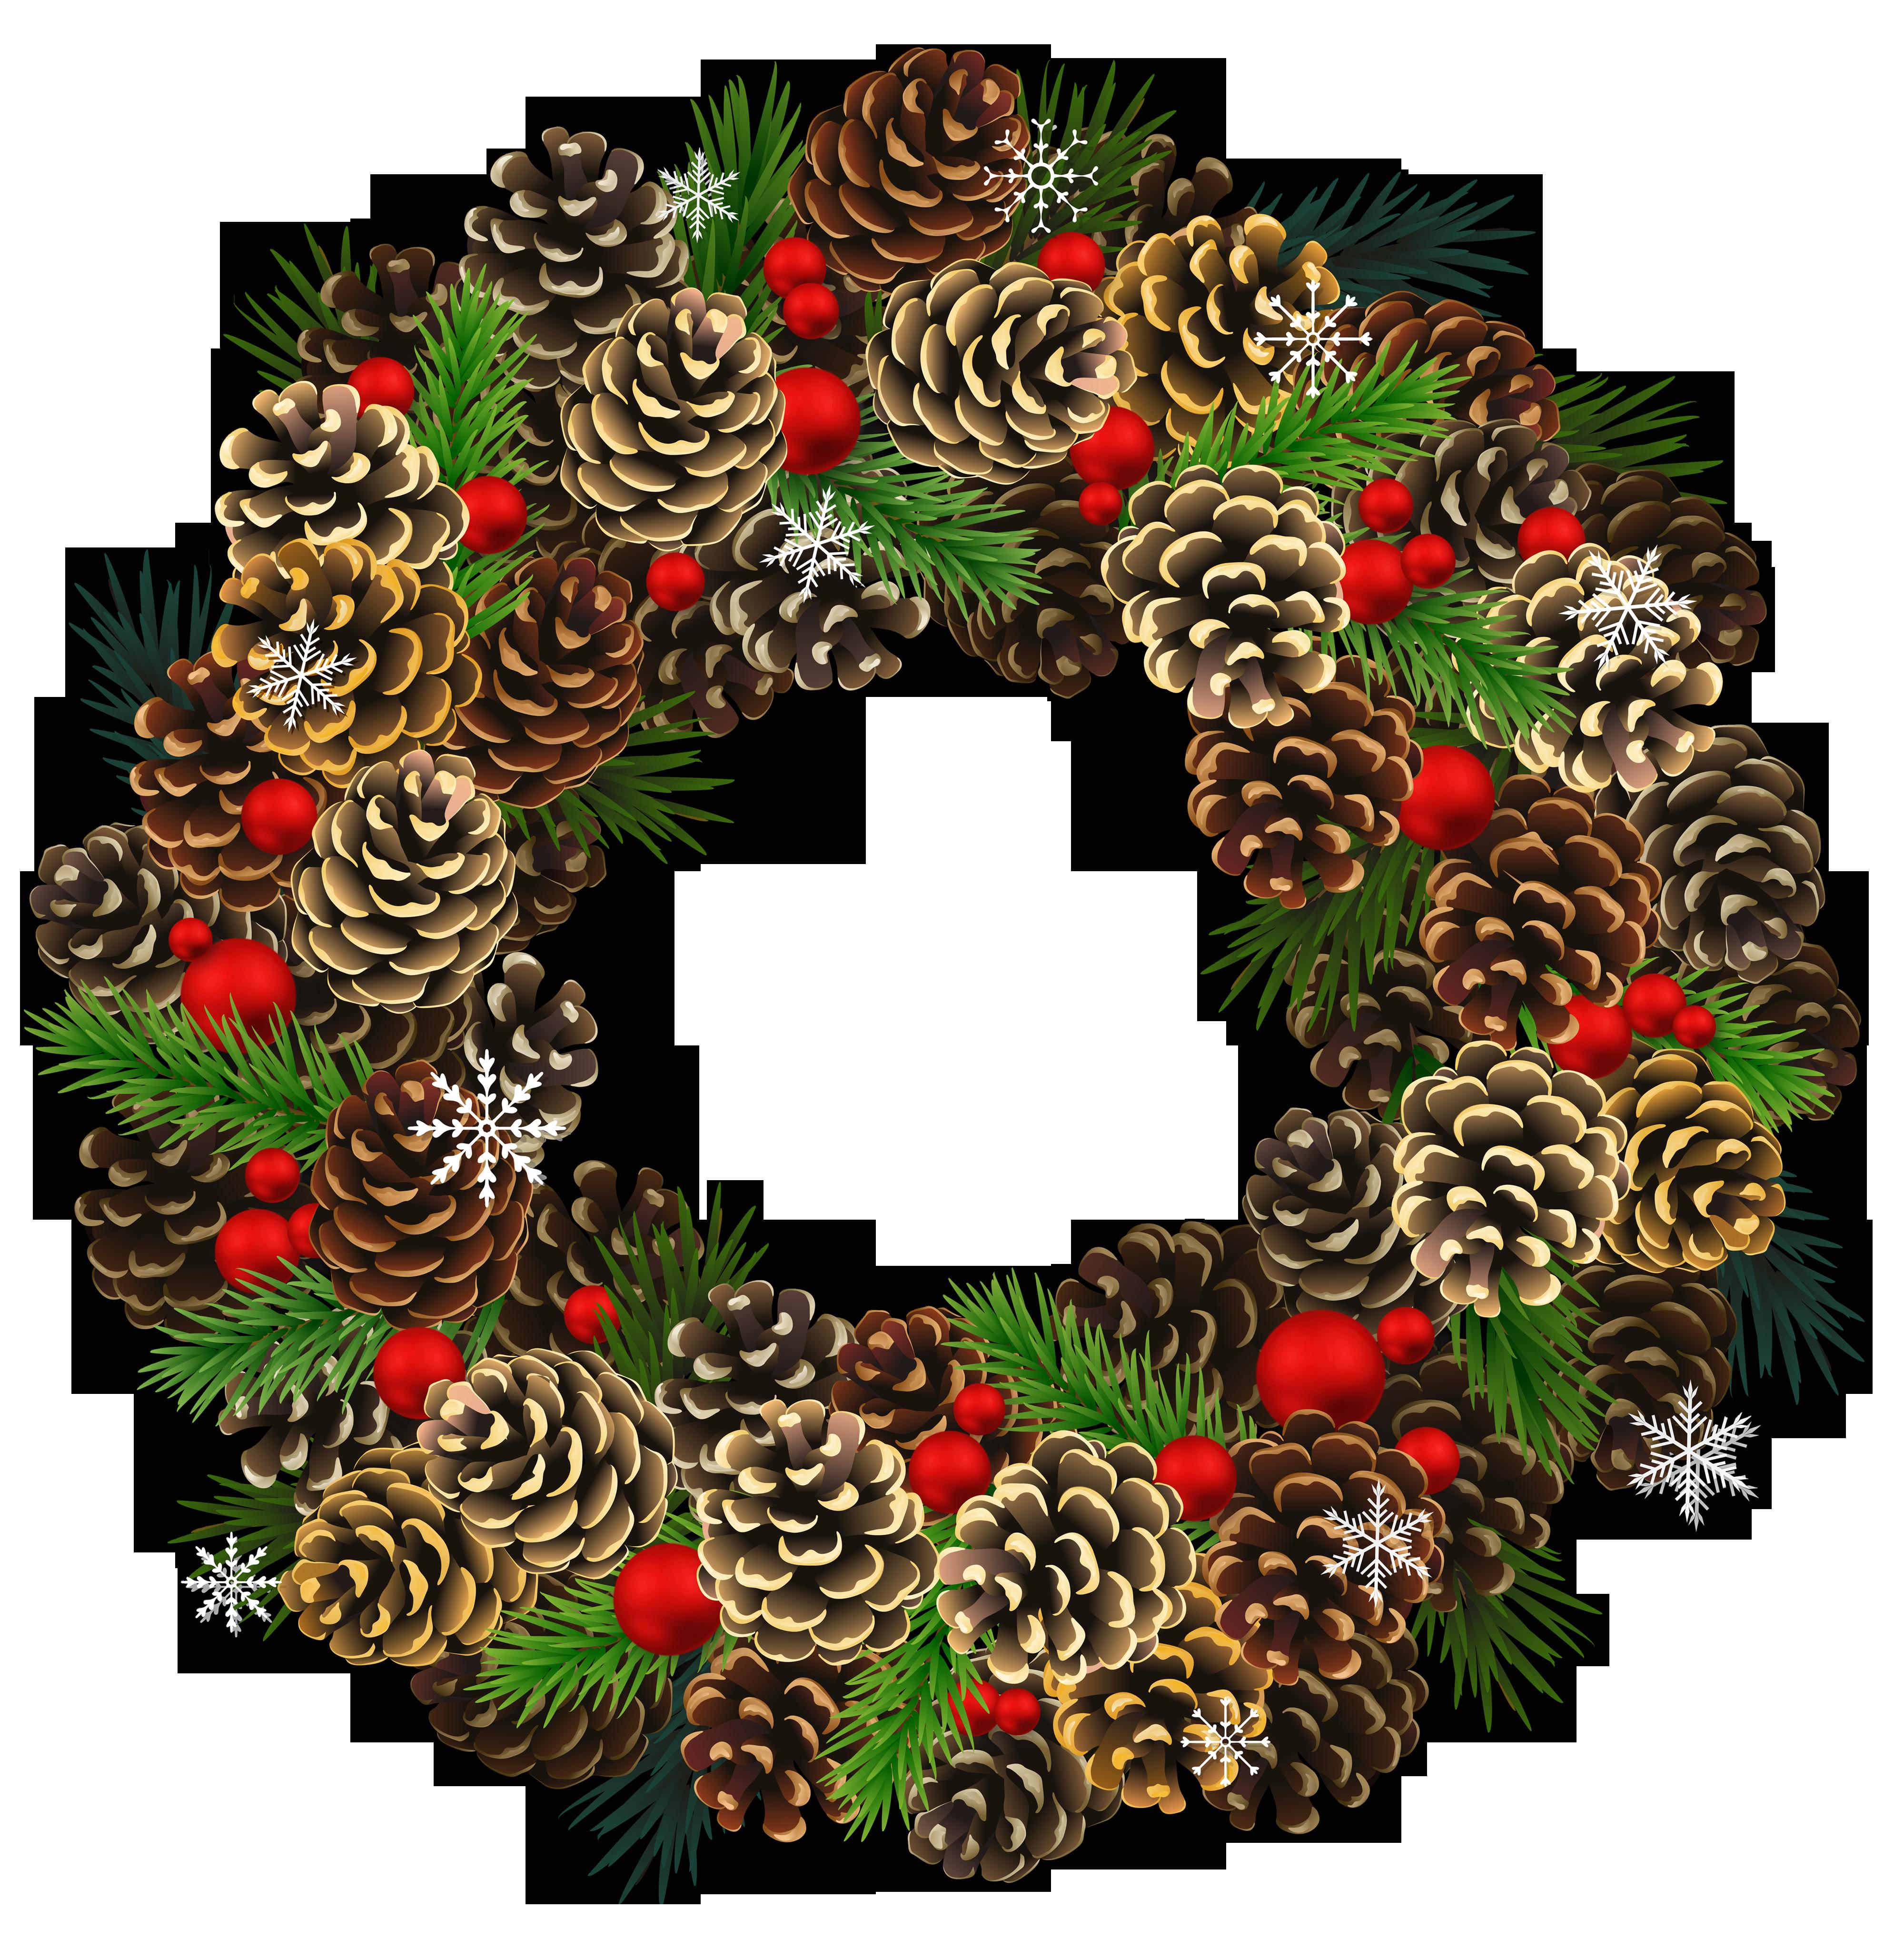 Christmas pinecone clipart clip art download Transparent Christmas Pinecone Wreath PNG Clipart | Gallery ... clip art download